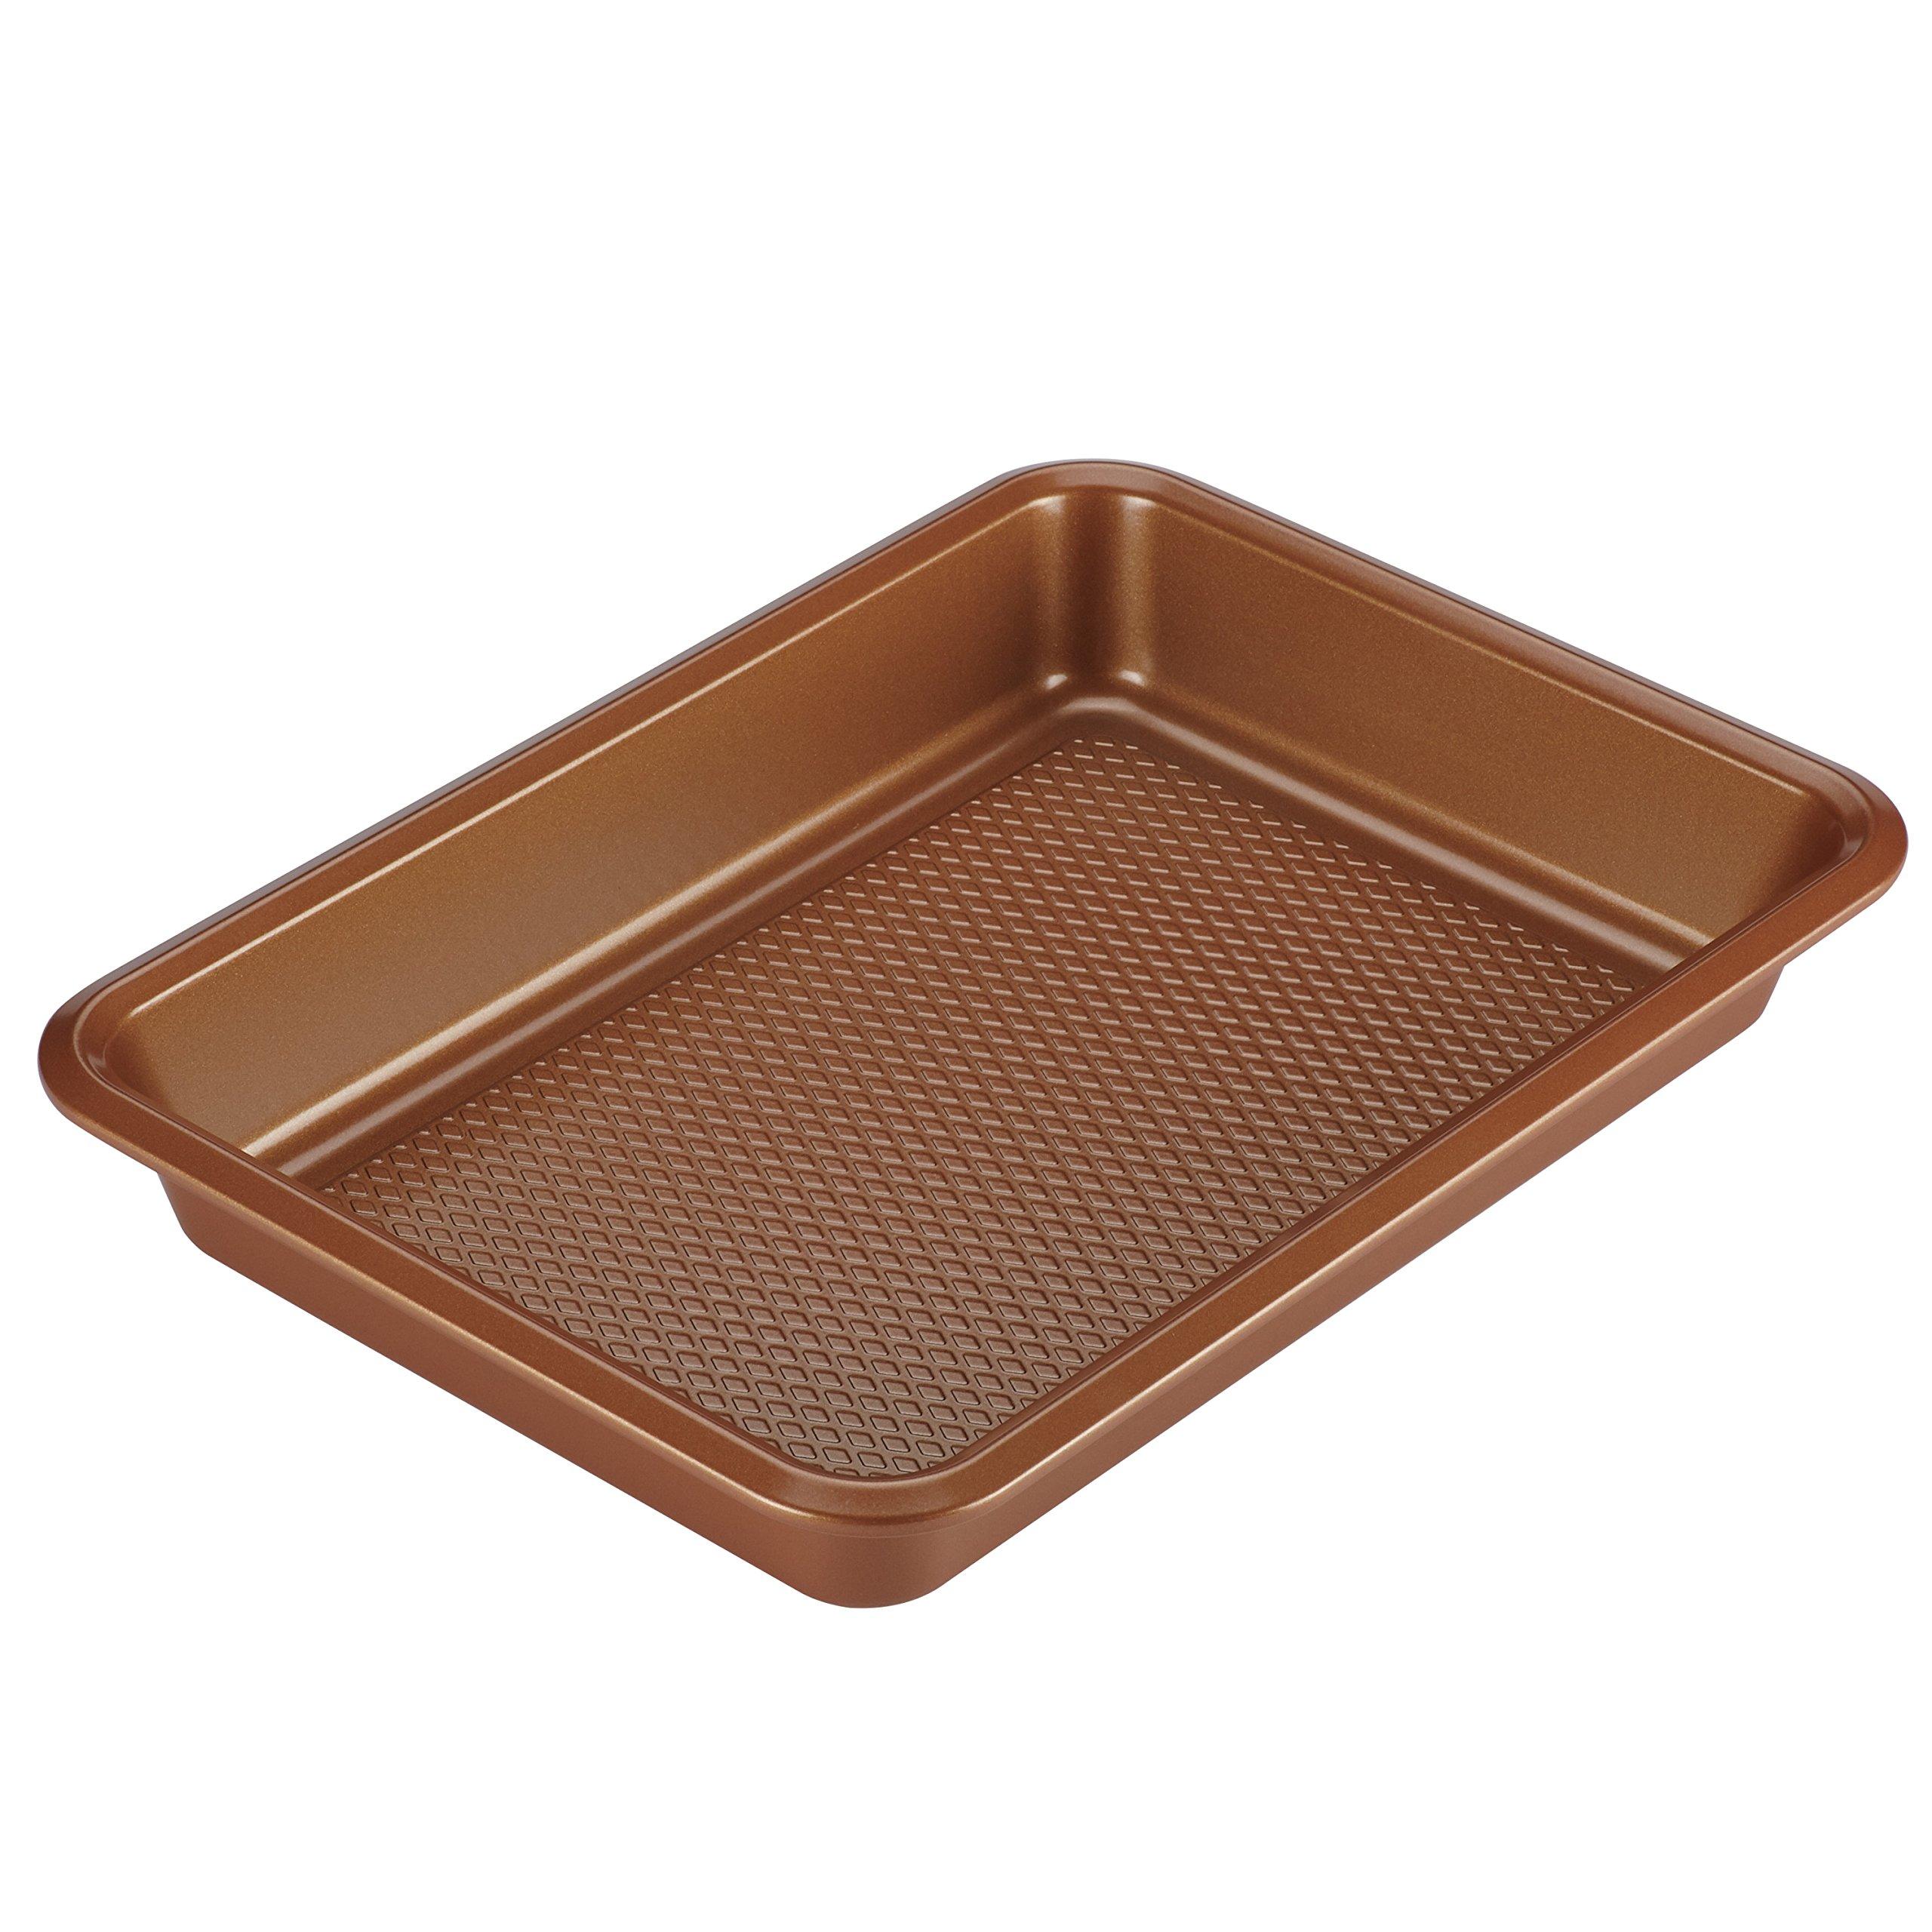 Ayesha Bakeware Cake Pan, 9-Inch x 13-Inch, Copper